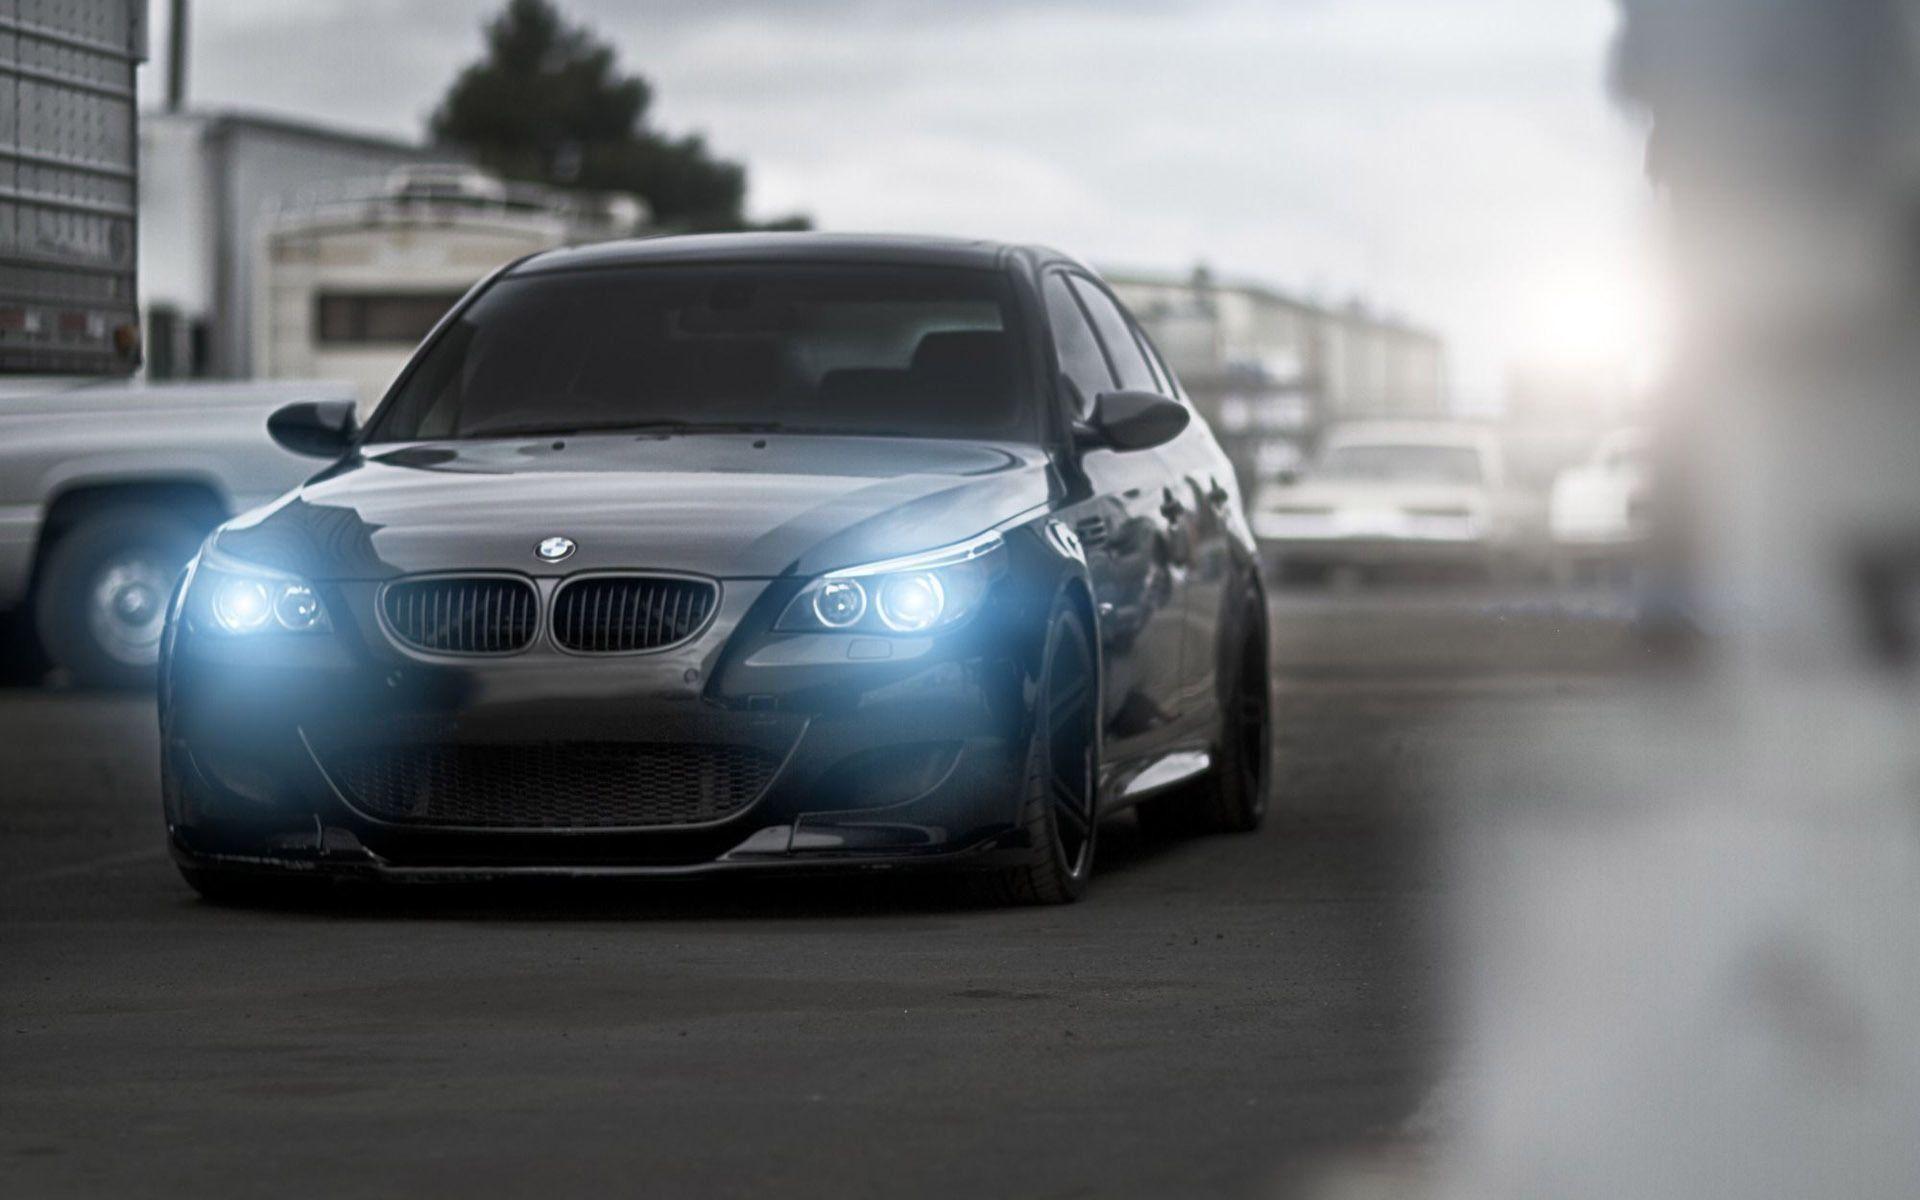 BMW M5 Wallpaper 76 images 1920x1200